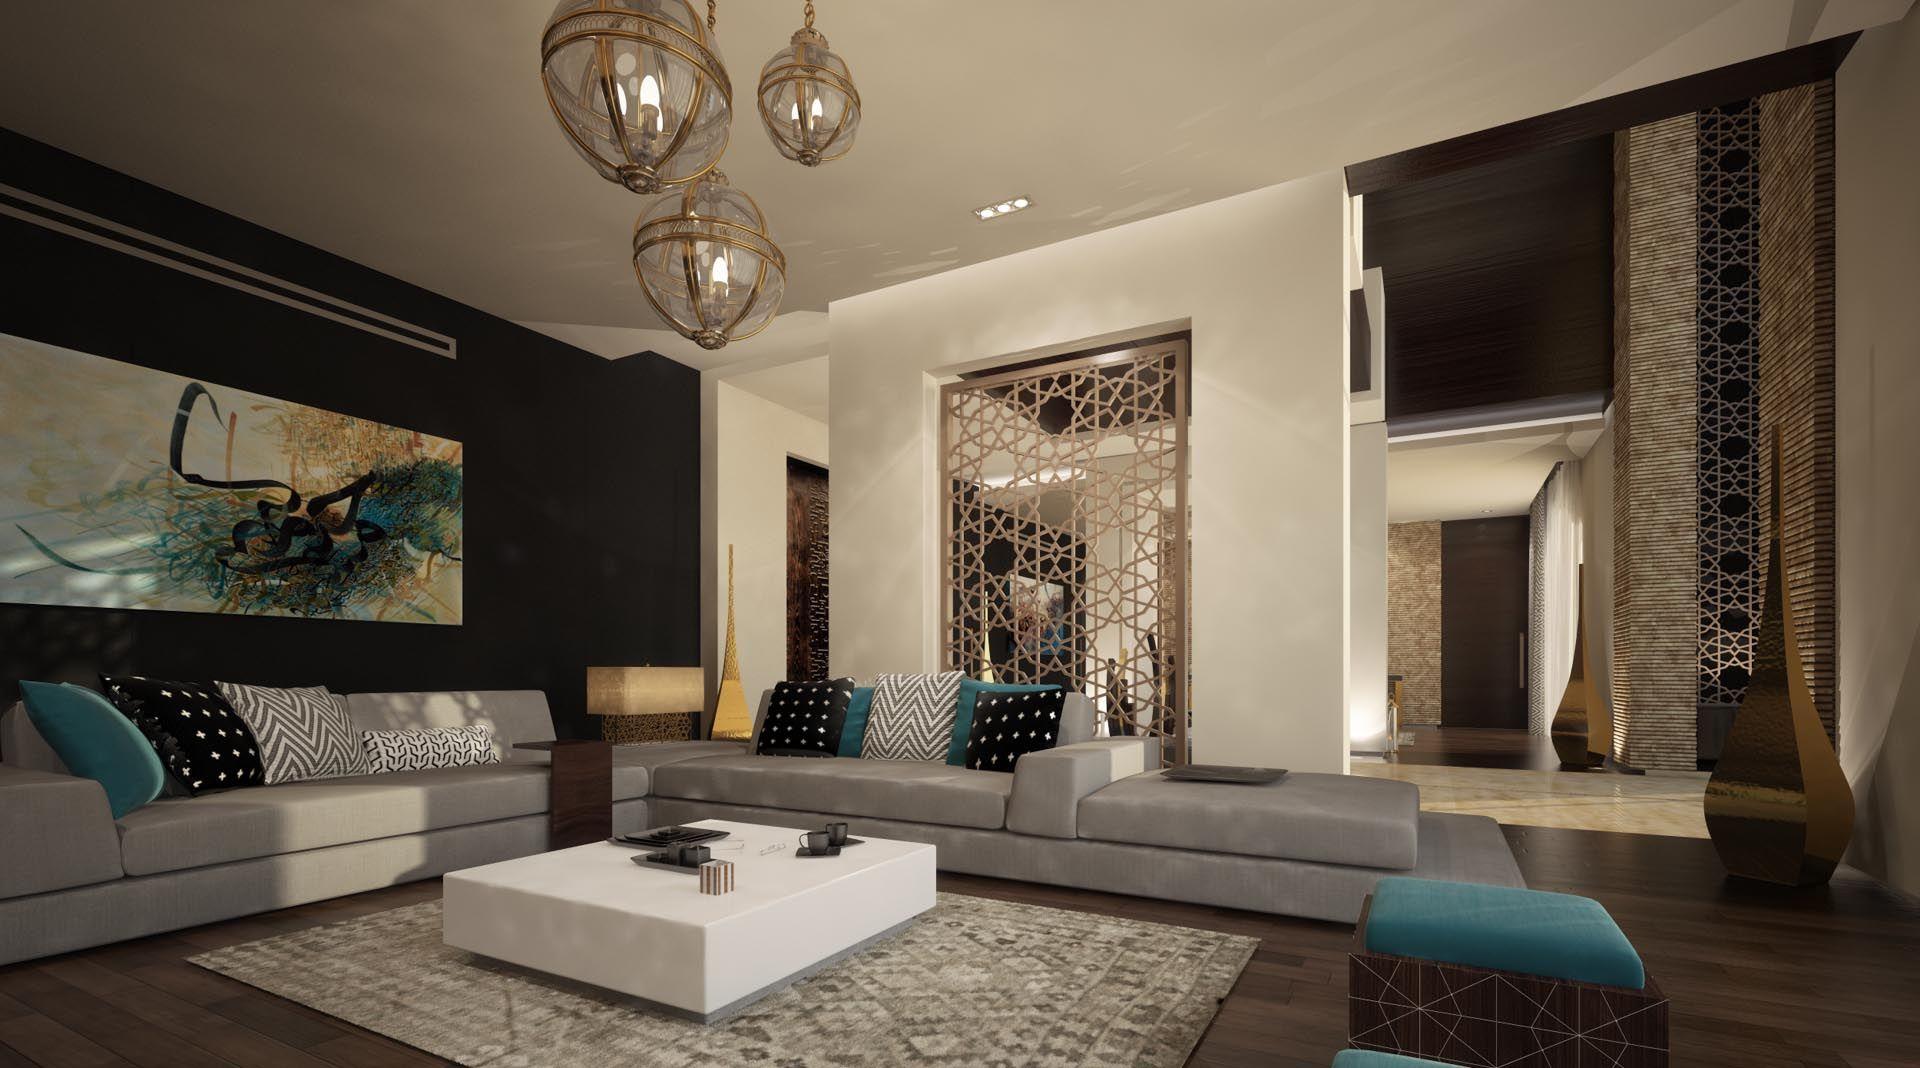 Sunken Living Room Moroccan Living Room Living Room Design Inspiration Moroccan living room designs